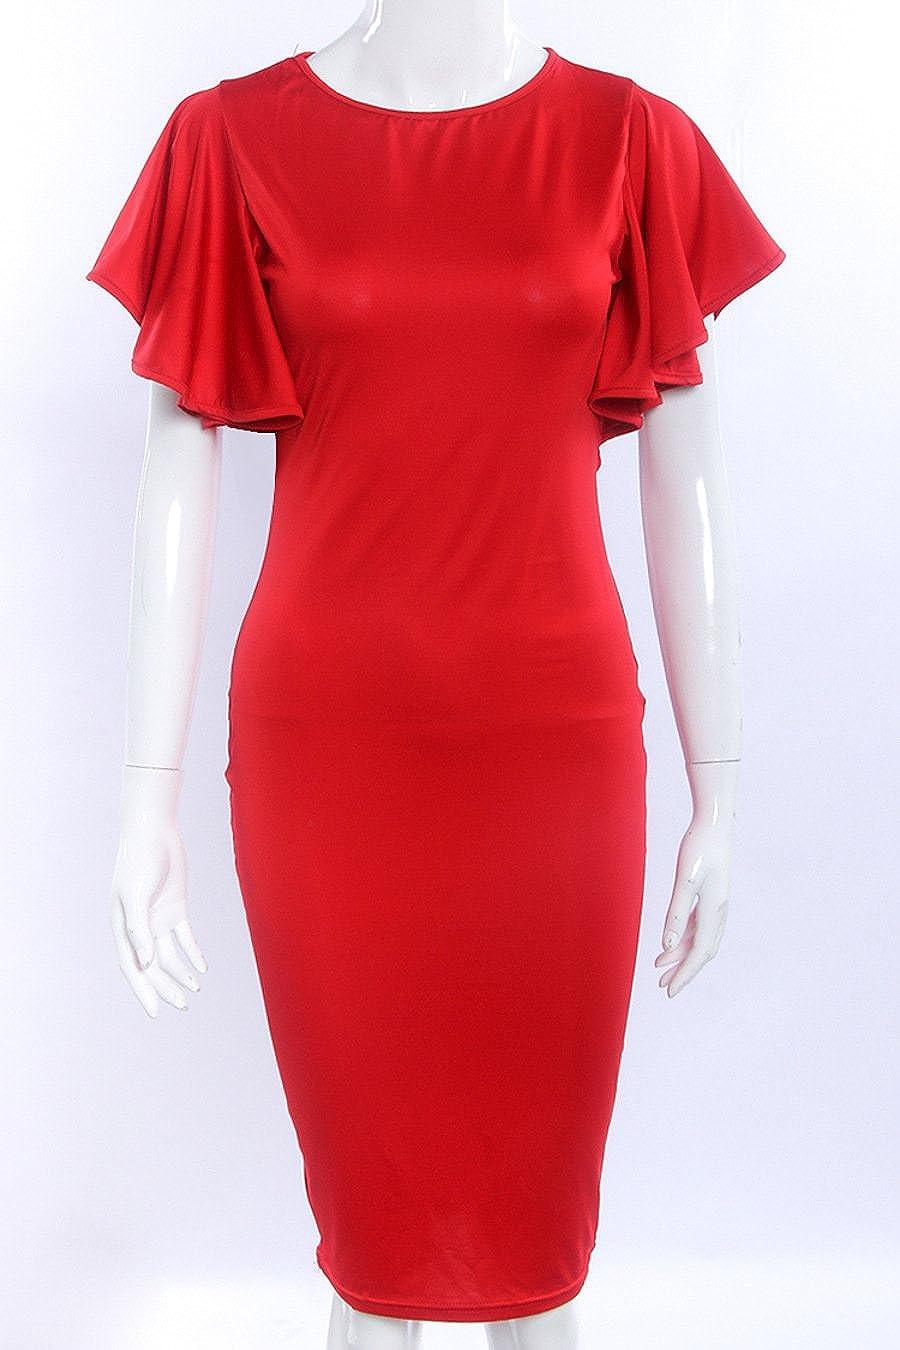 RAFAGO Trend Slim Short Sleeve Midi Dress